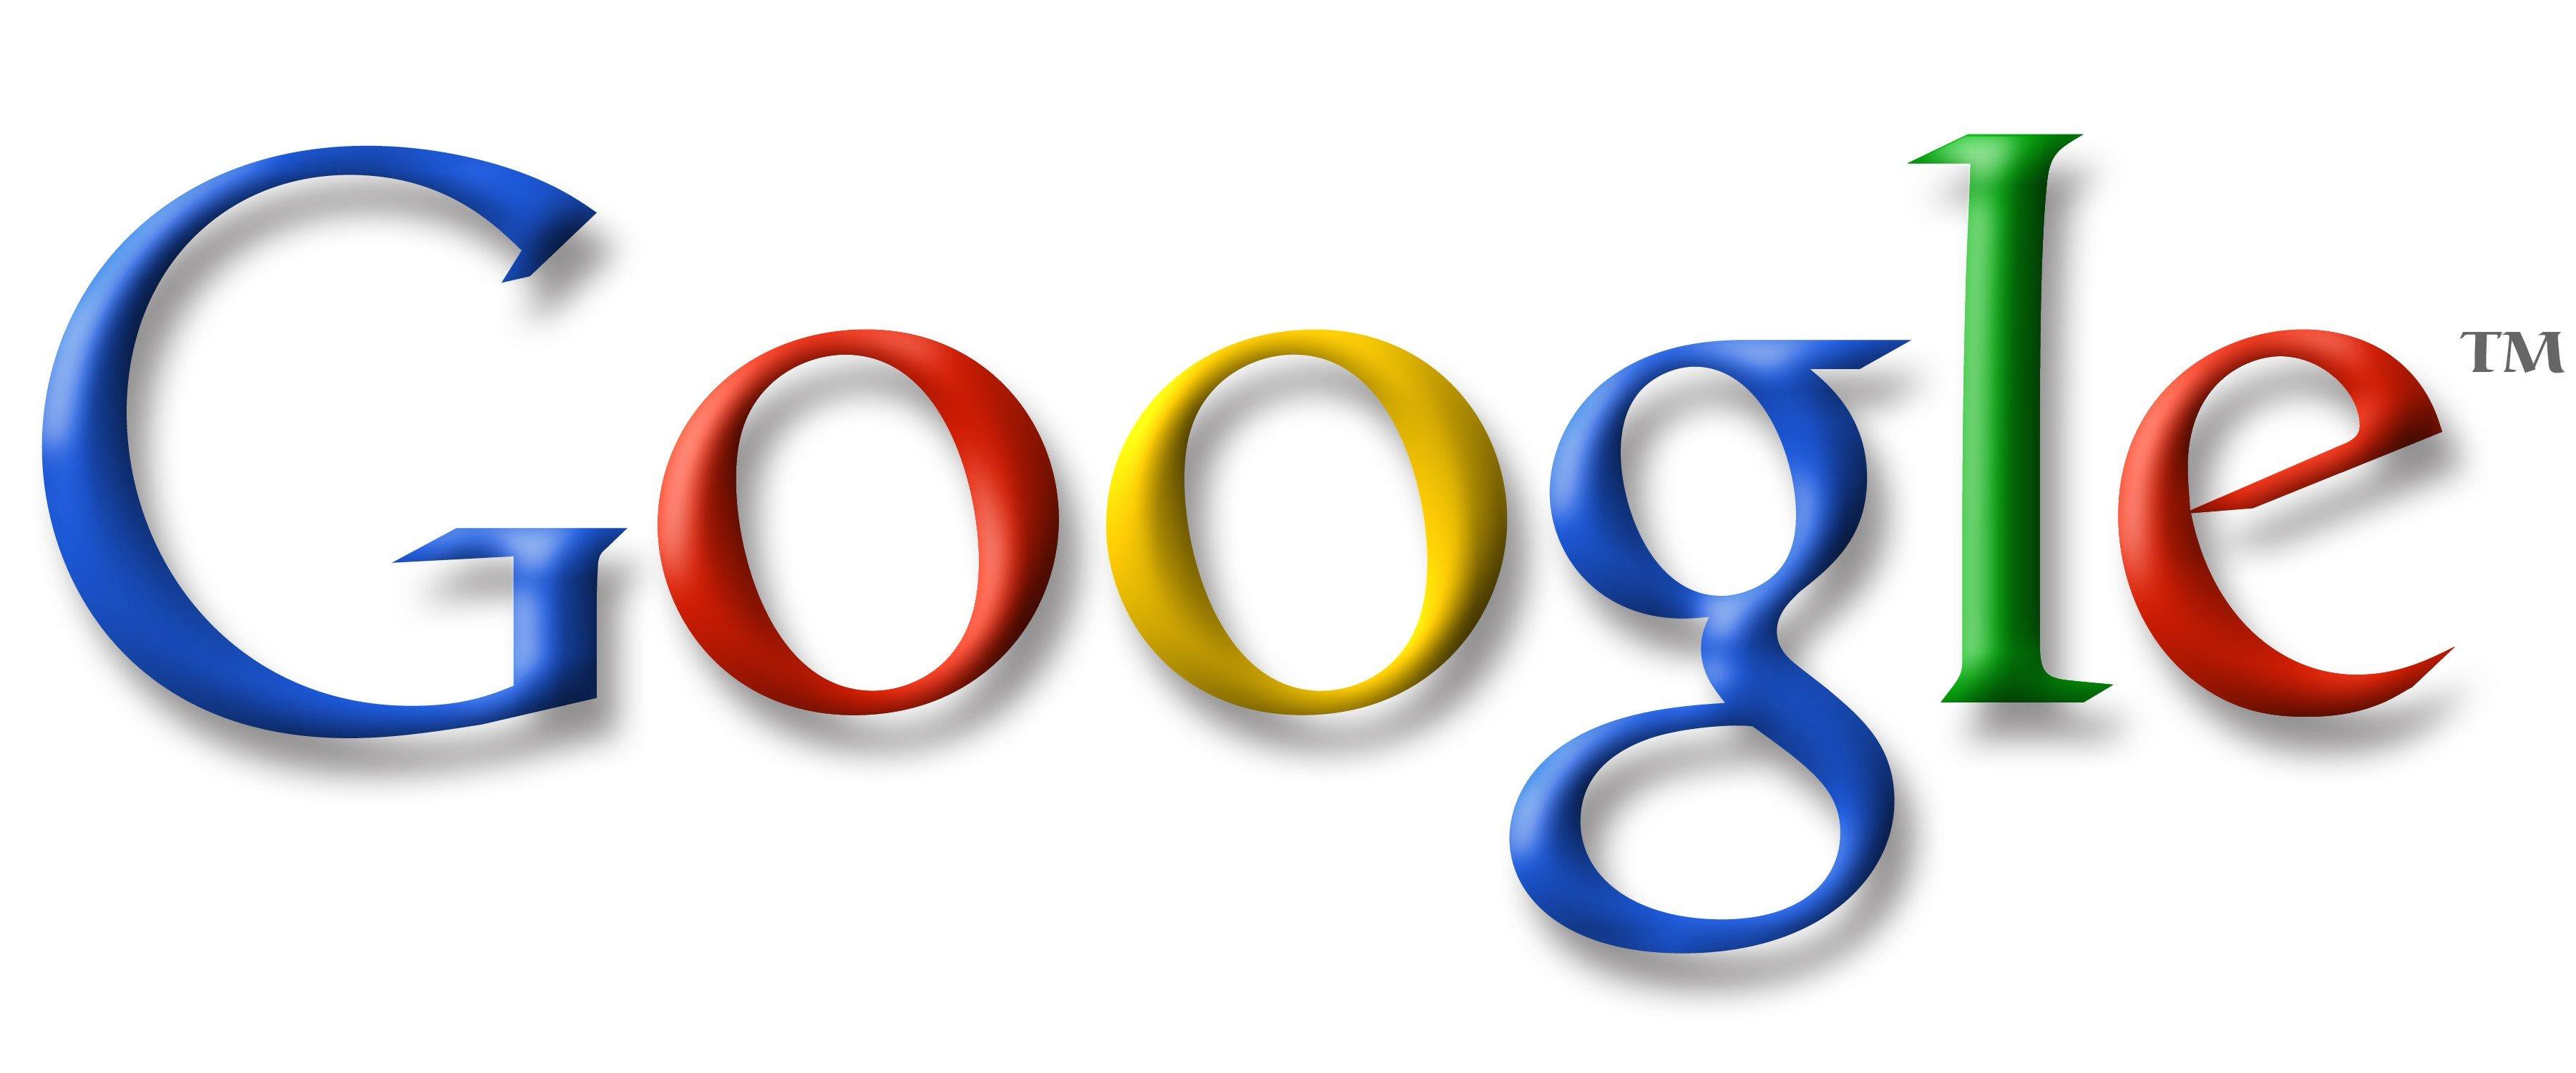 Google's 3 Principles of Link Love